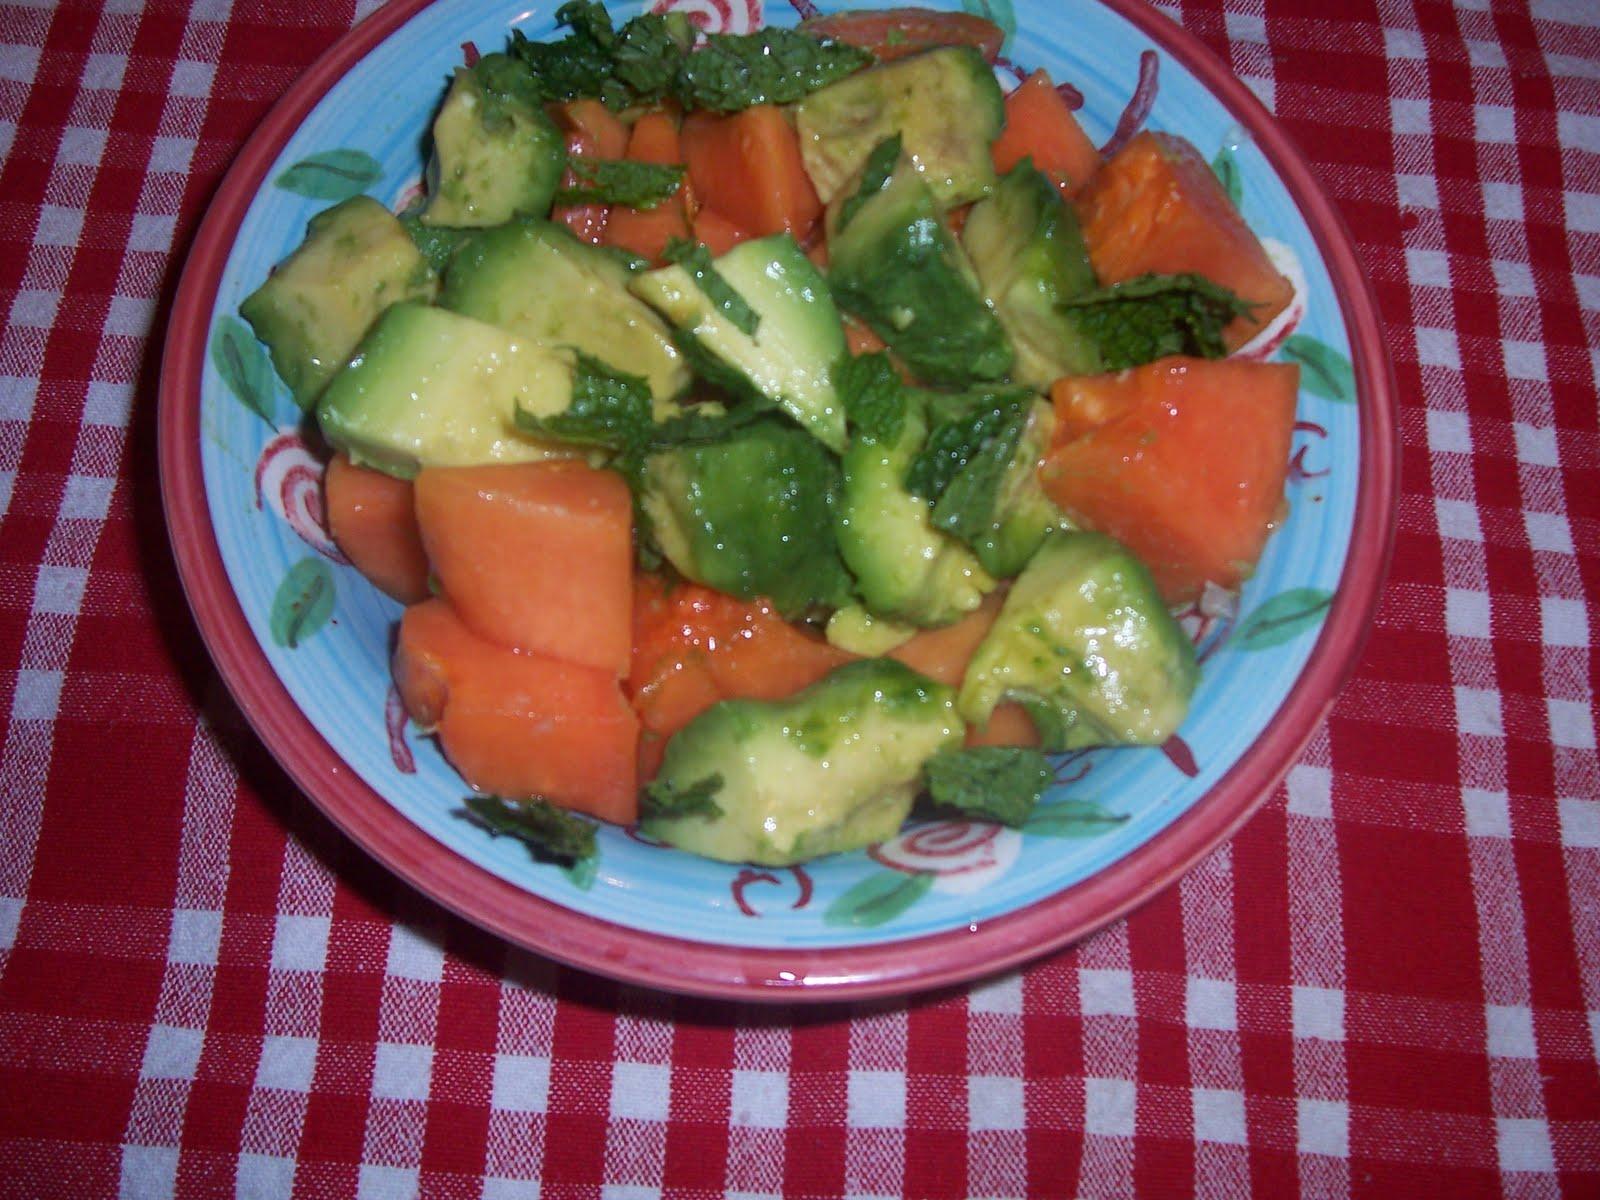 Indianfoodbazaar: Avocado Papaya Salad